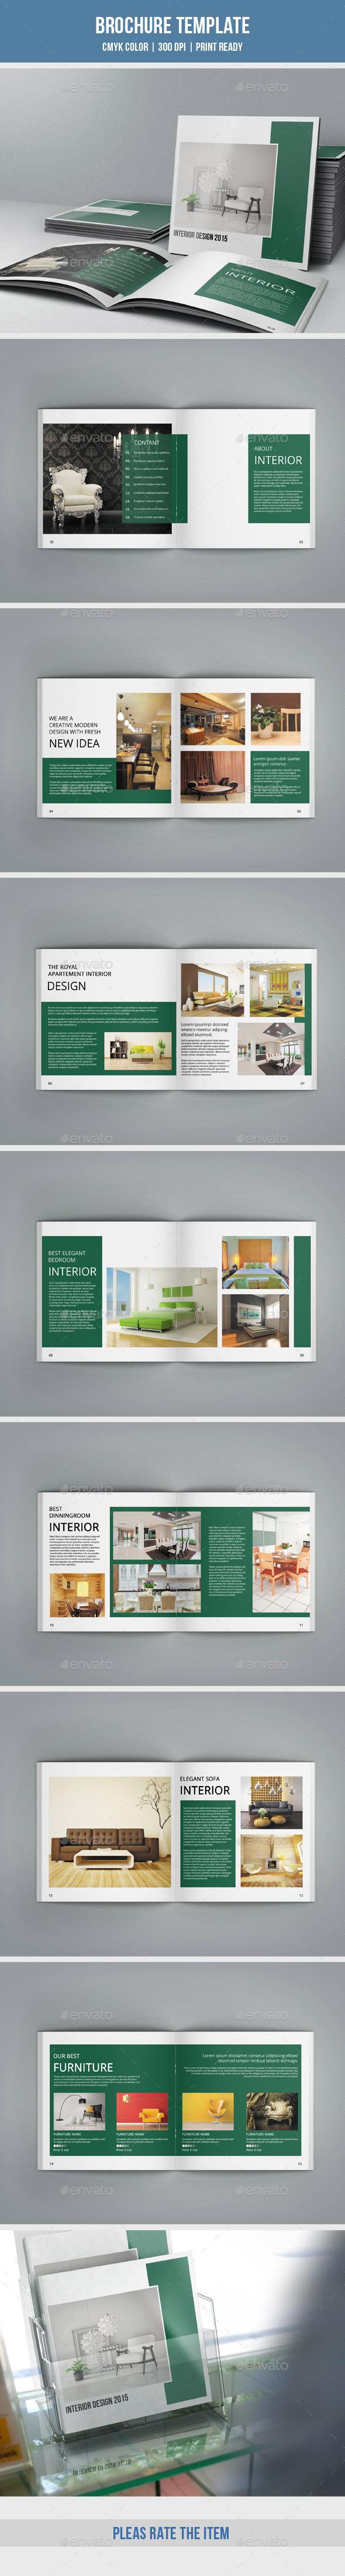 Corporate Square Bifold Brochure-V60 - Corporate Brochures